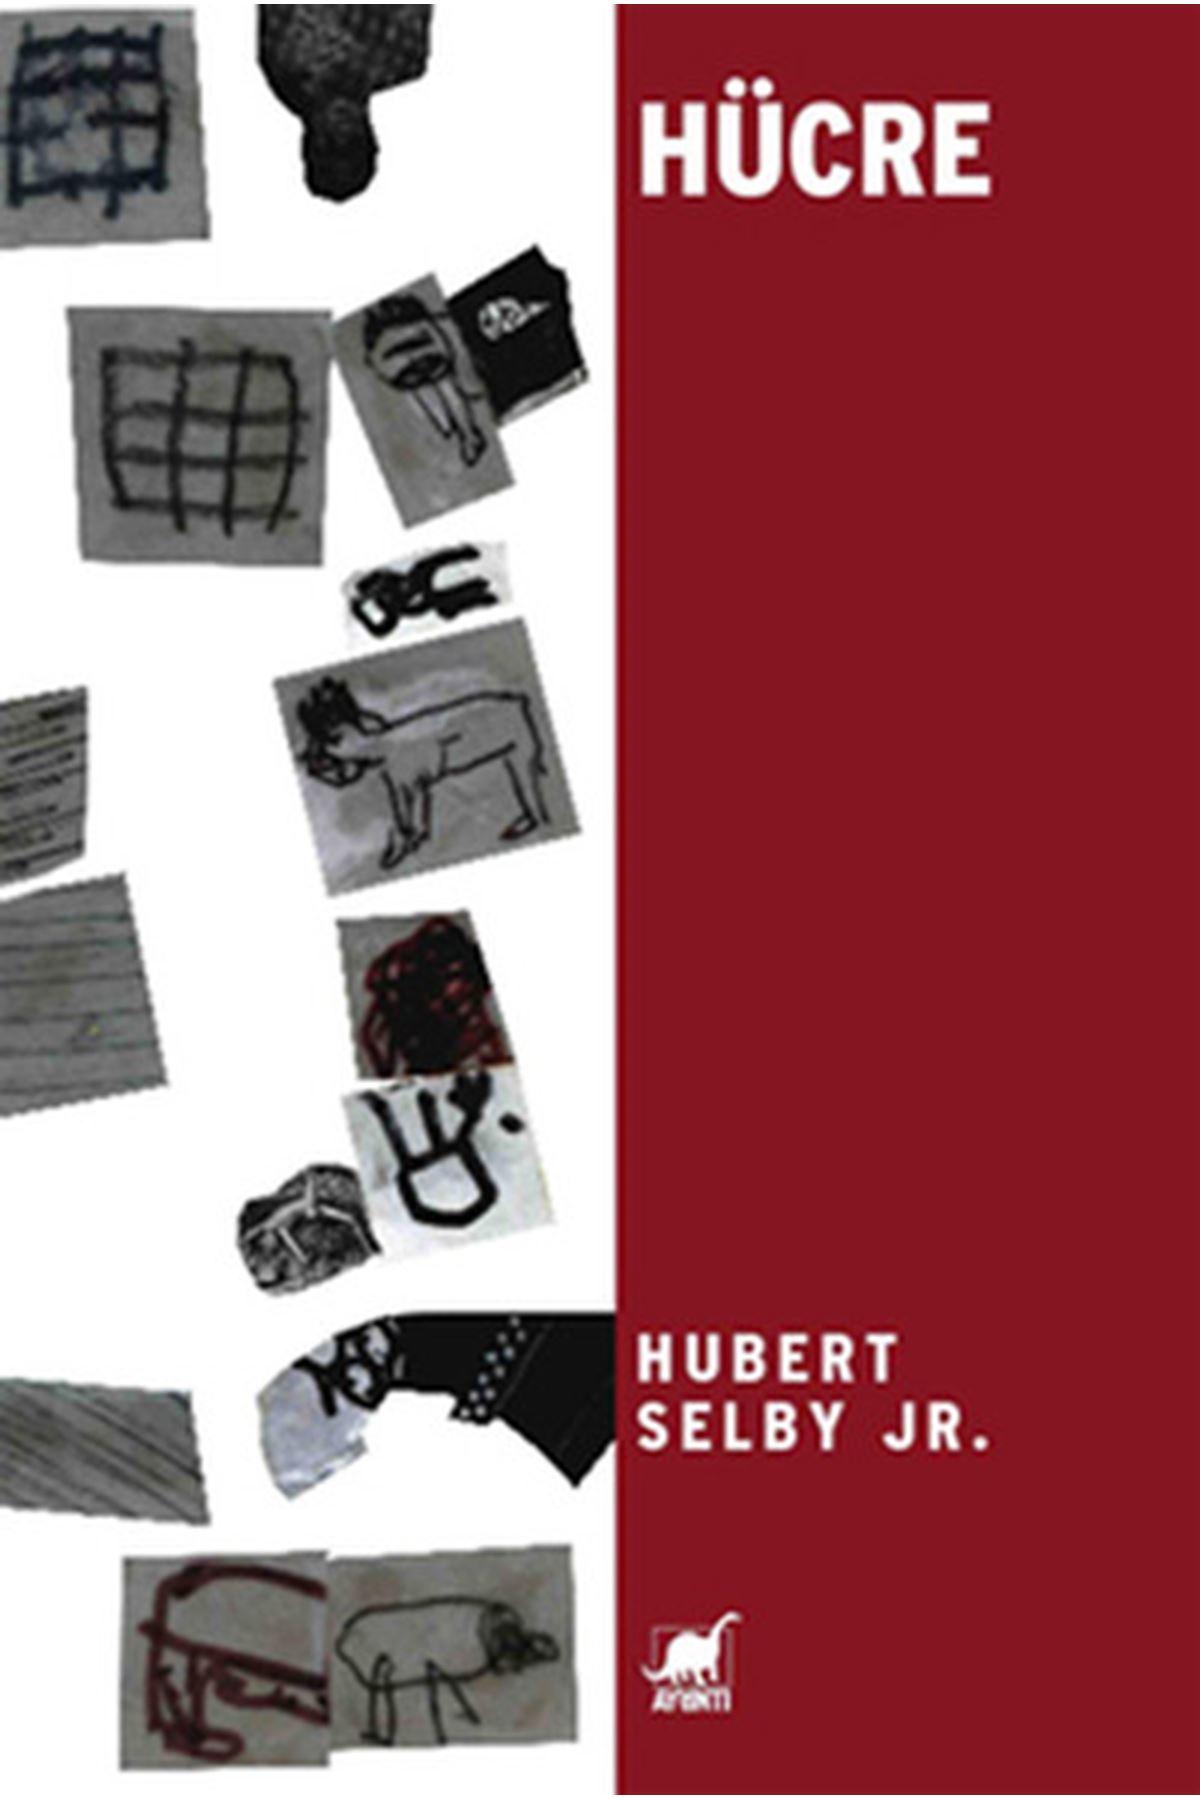 HUBERT SELBY - HÜCRE